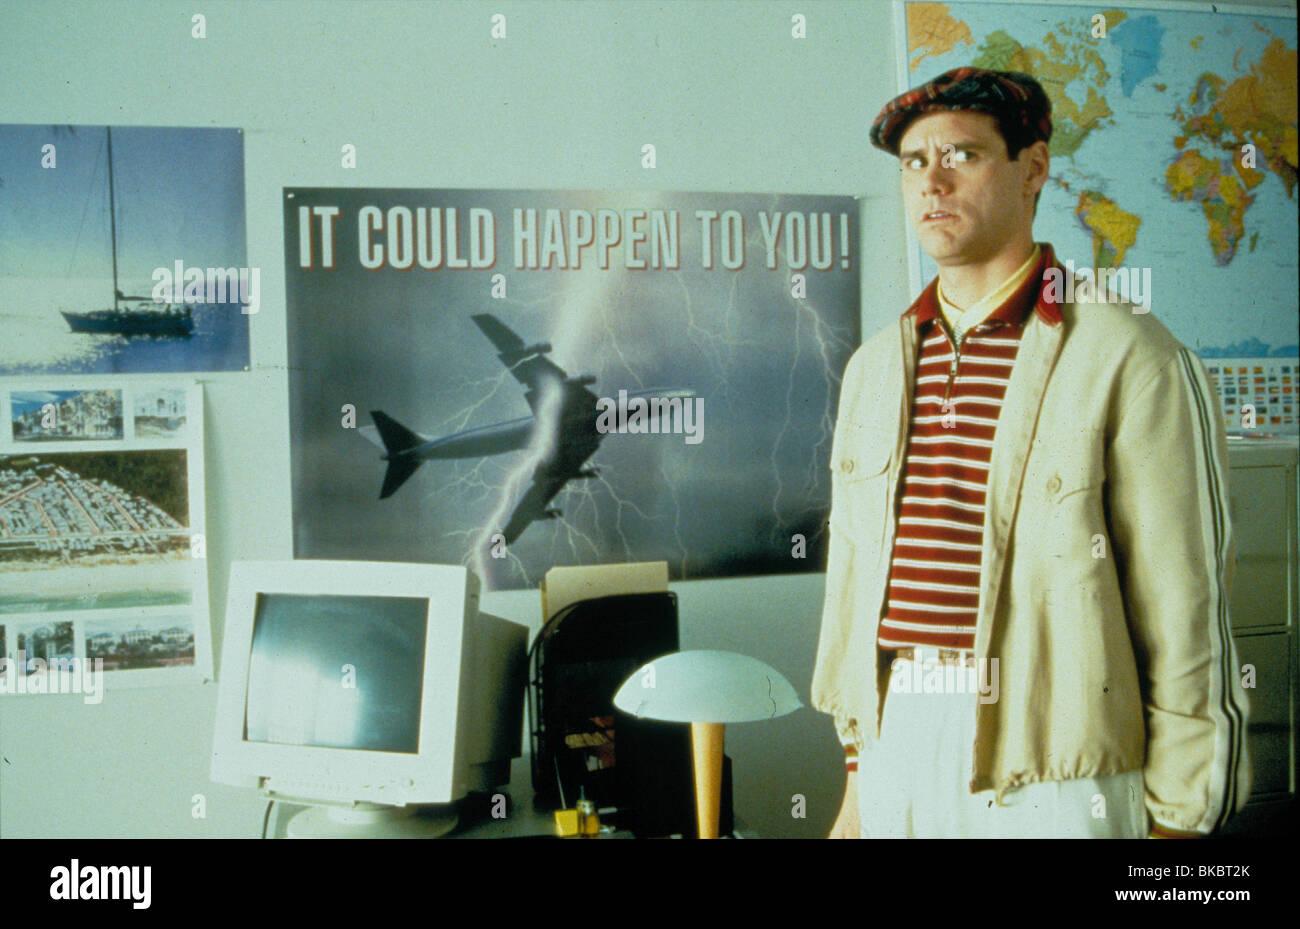 THE Truman Show (1997) JIM CARREY TSW 131 Photo Stock